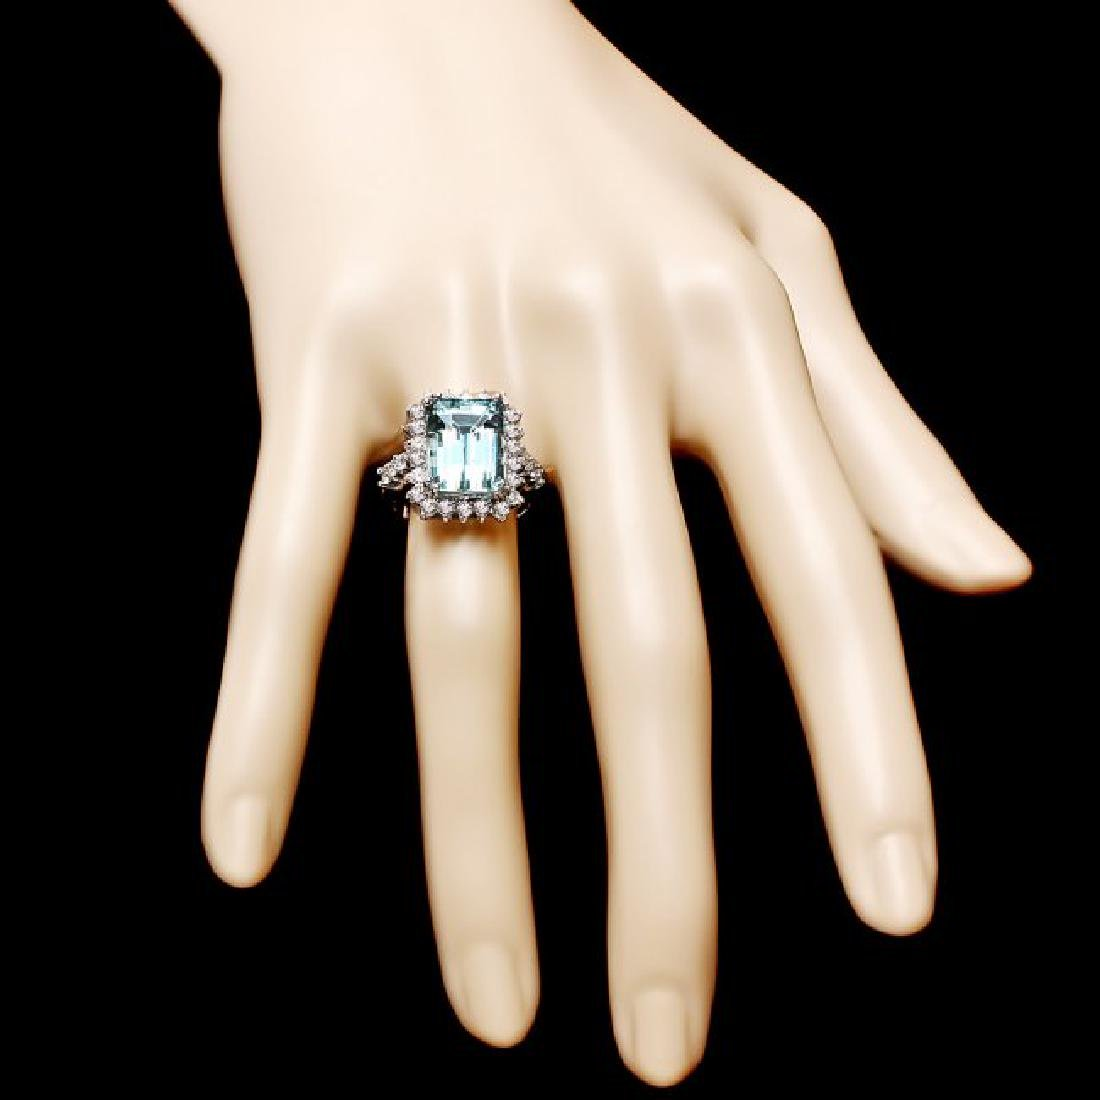 14k Gold 6.50ct Aquamarine 1.00ct Diamond Ring - 4